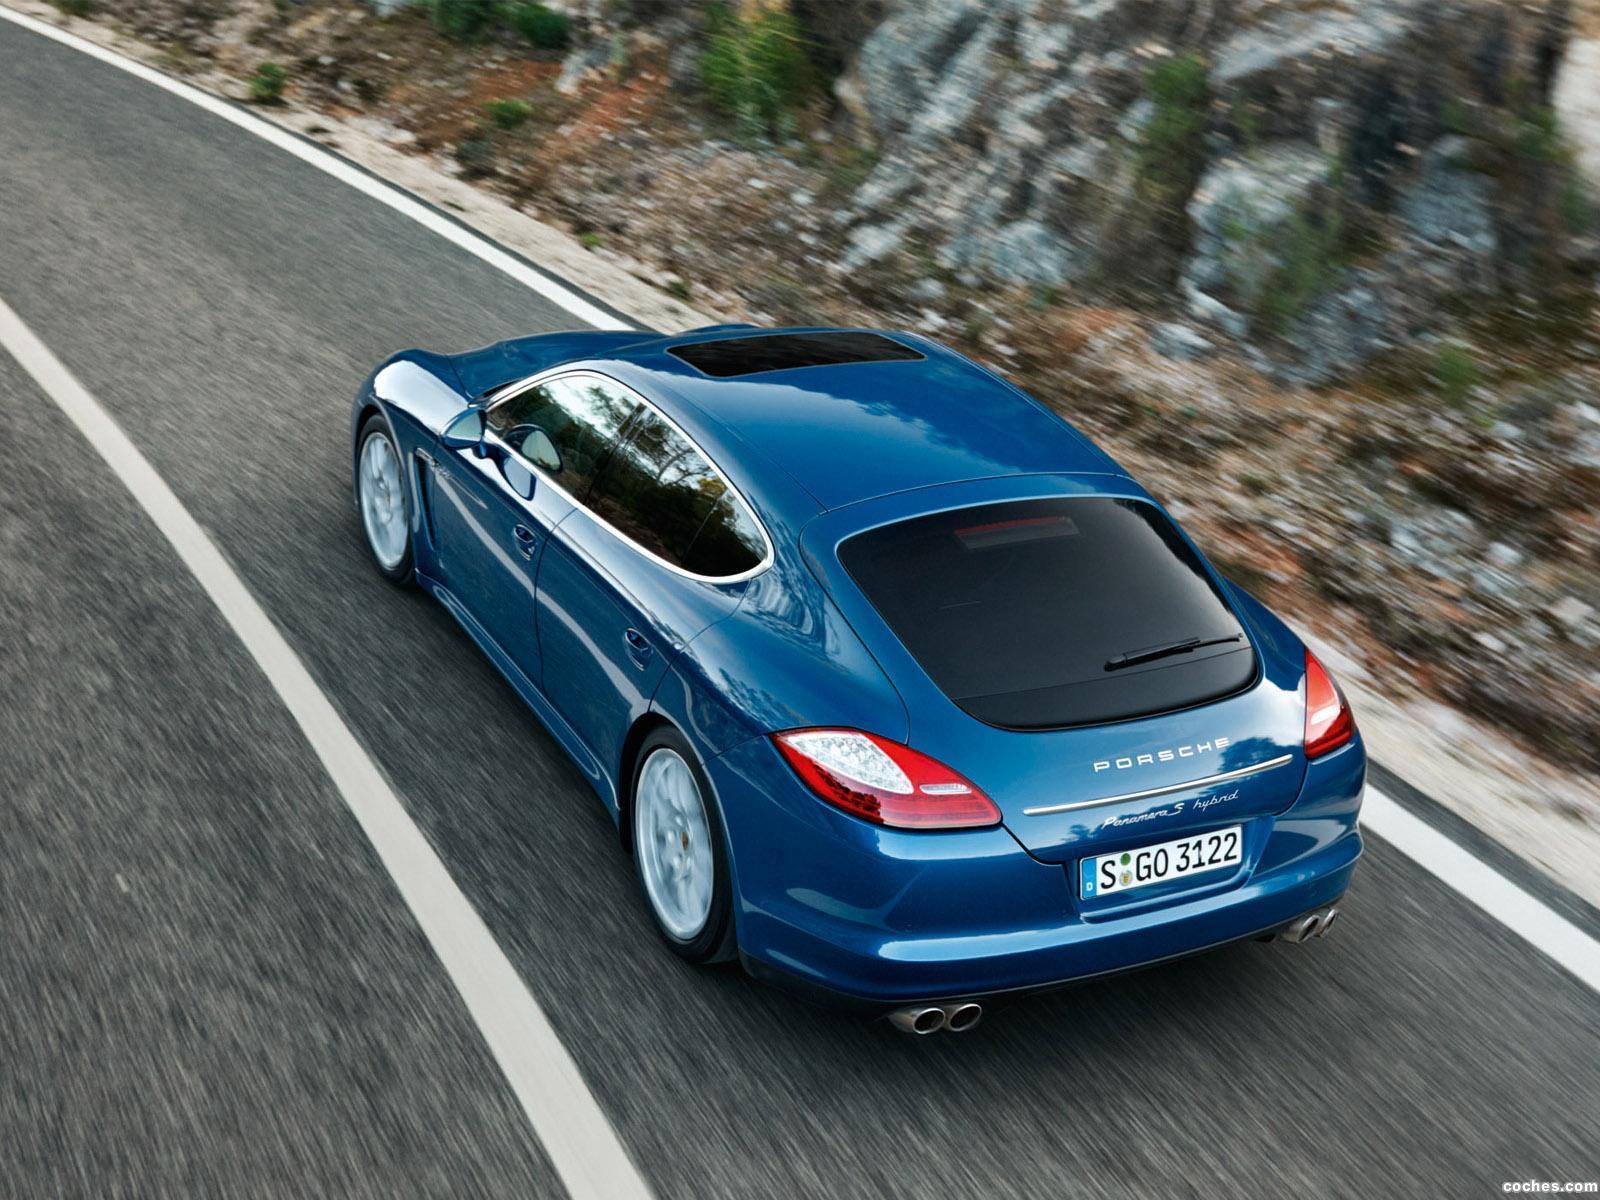 Foto 1 de Porsche Panamera S Hybrid 2011